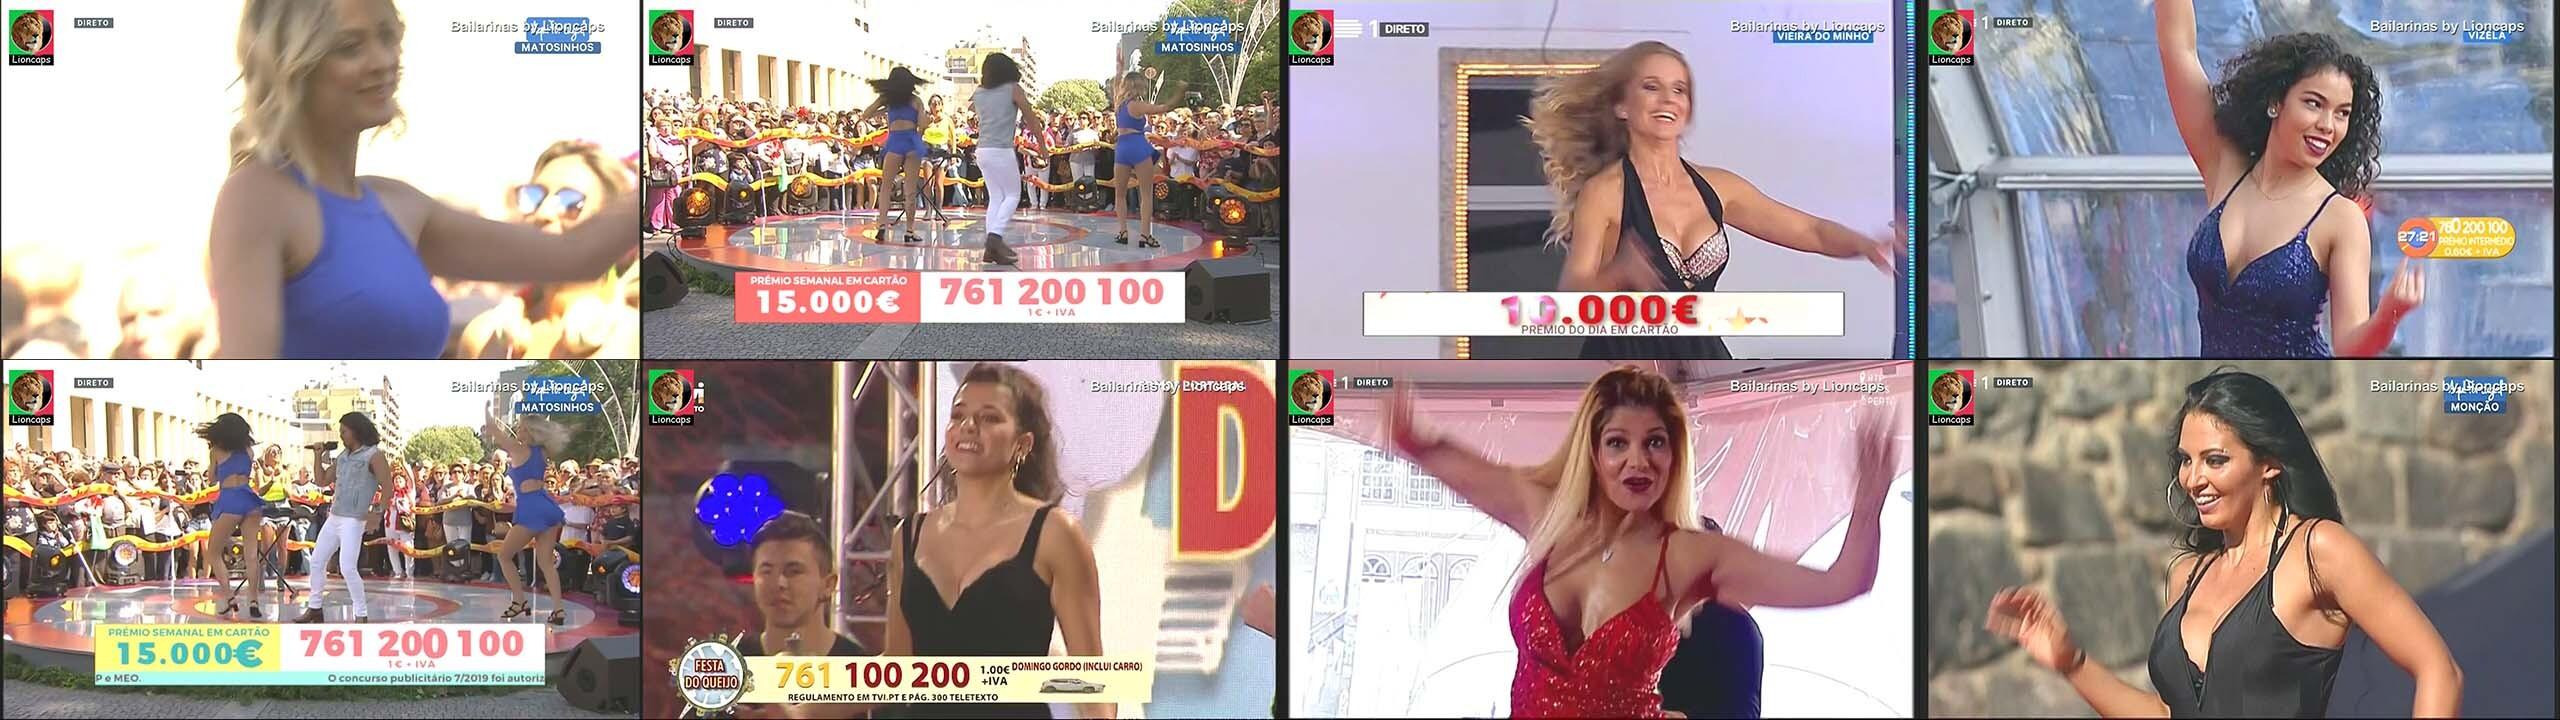 bailarinas_lioncaps_10_08_2020_01.jpg